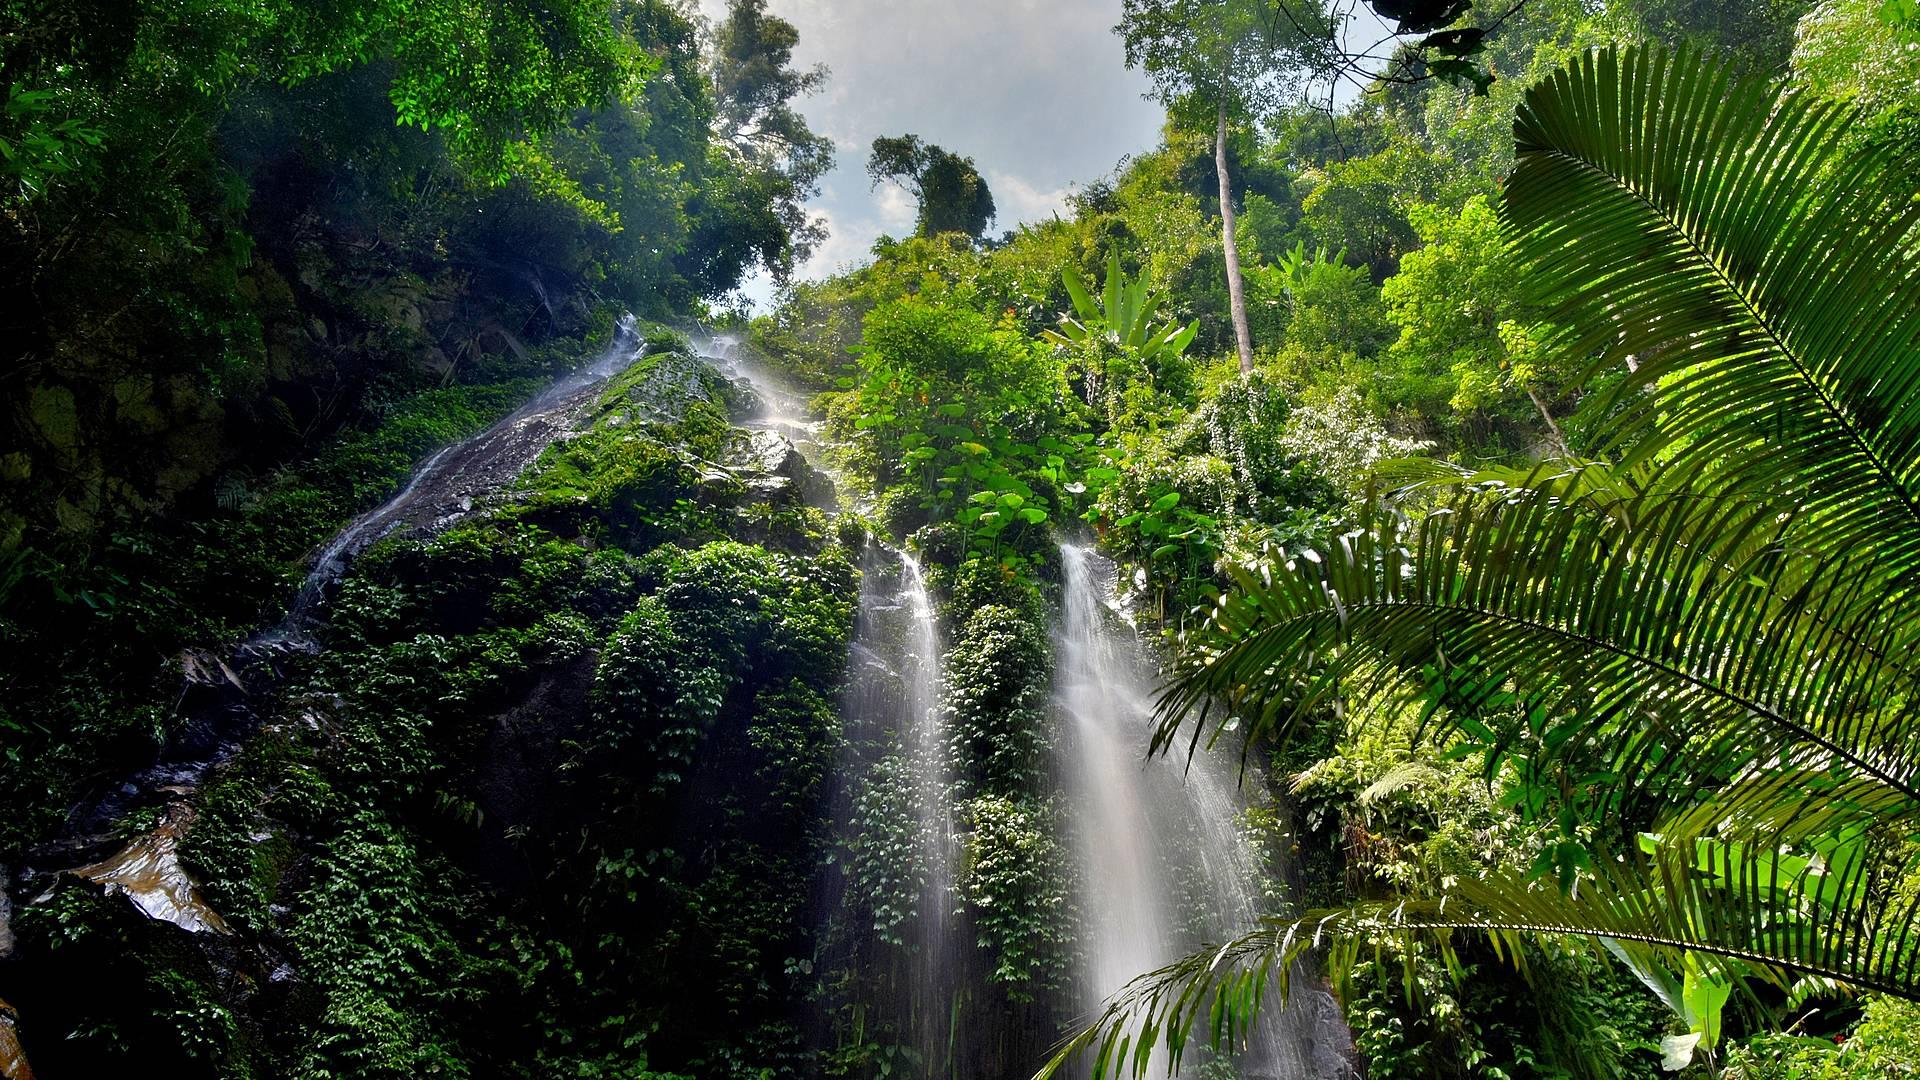 Selva e historia en Malasia